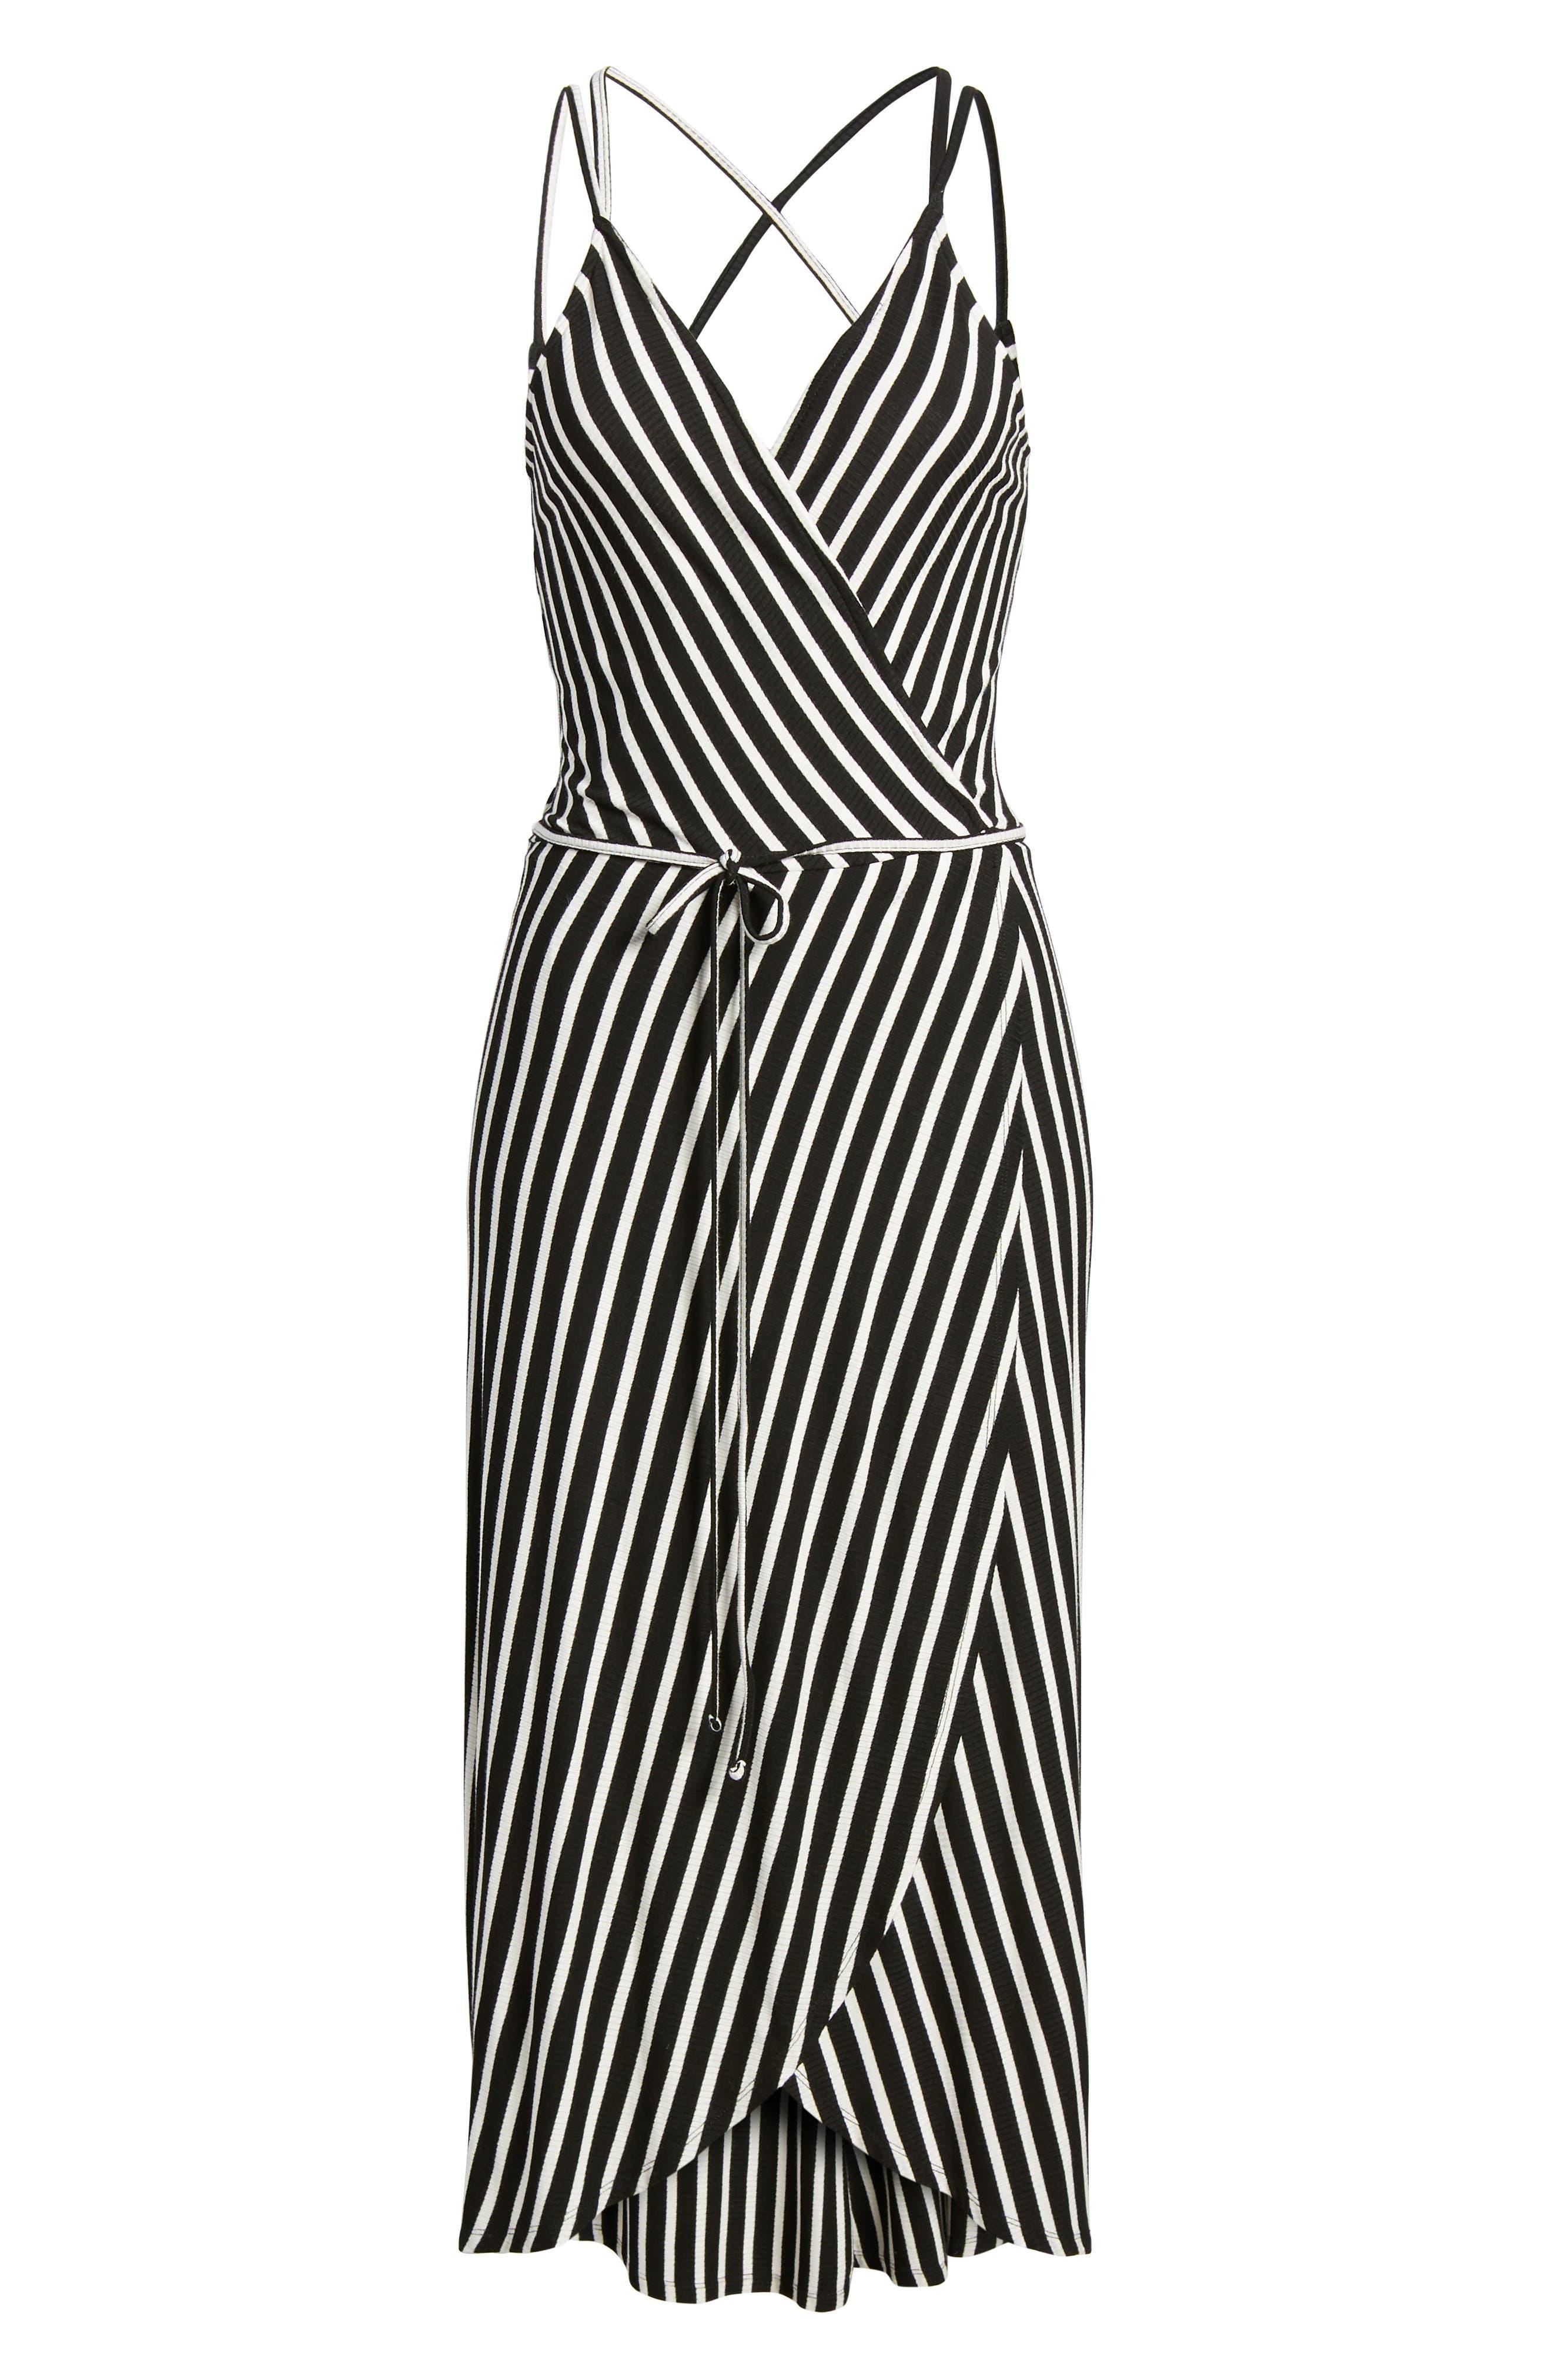 Ribbed Stripe Wrap Dress,                             Alternate thumbnail 6, color,                             Black/ White Stripe